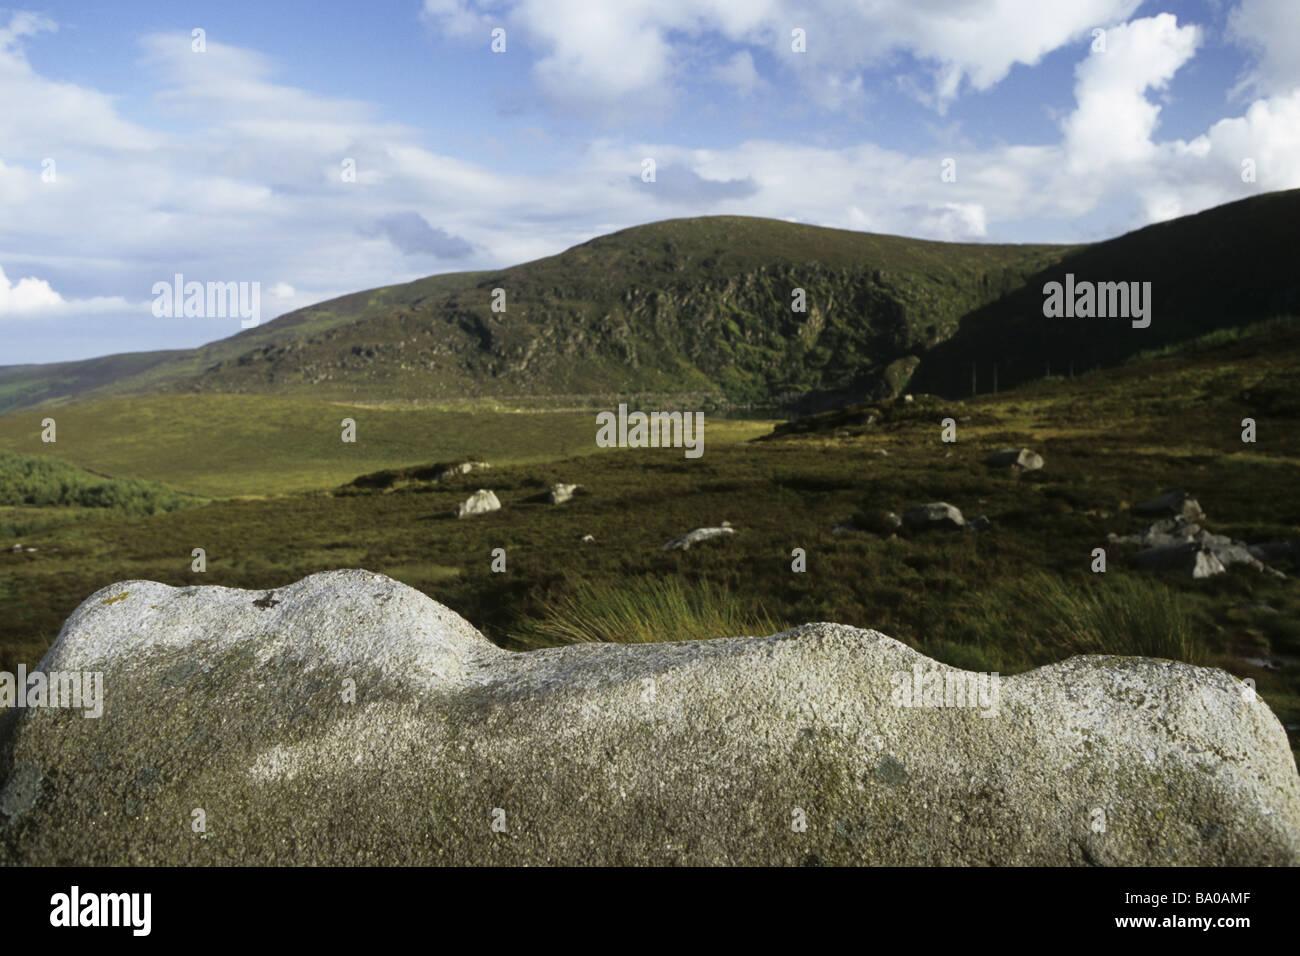 West of Ireland - Stock Image